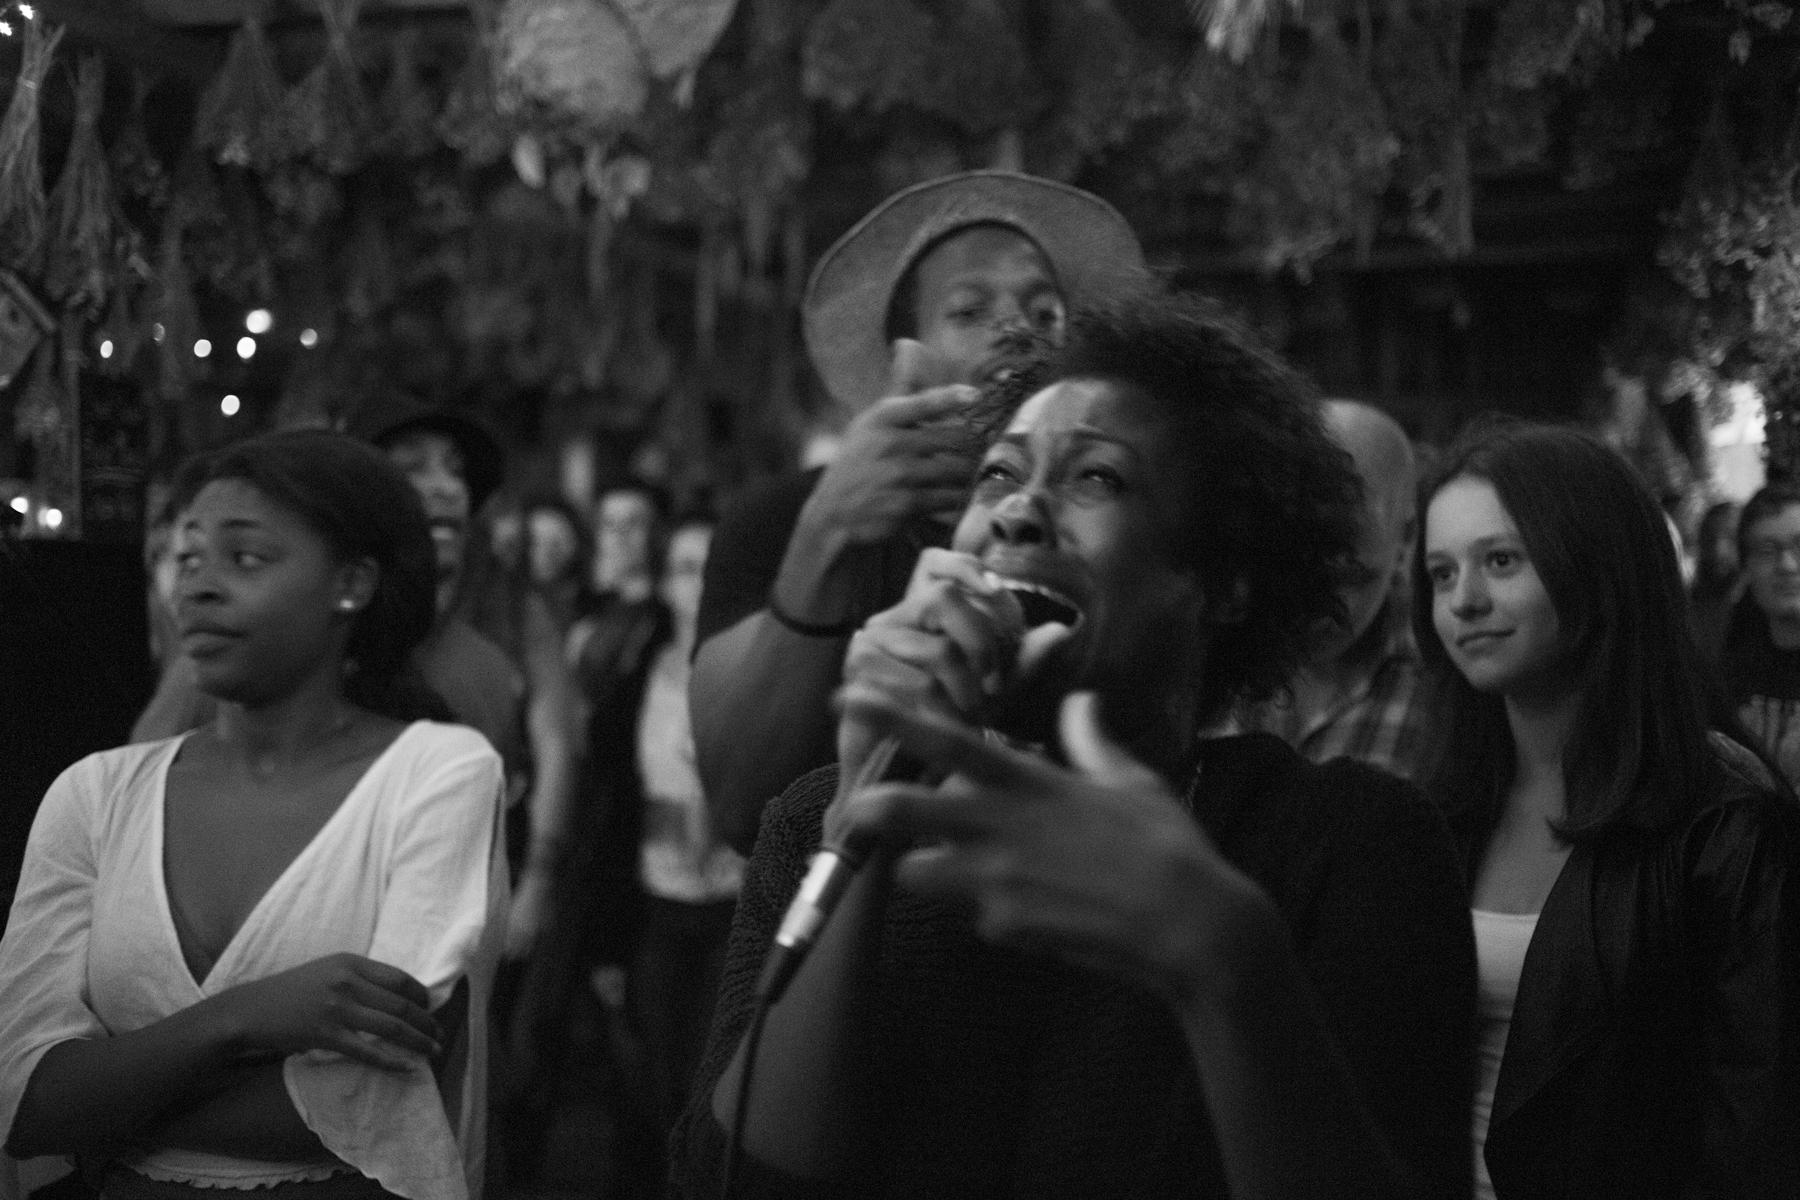 Sammus at Littletree Orchard. 2015.